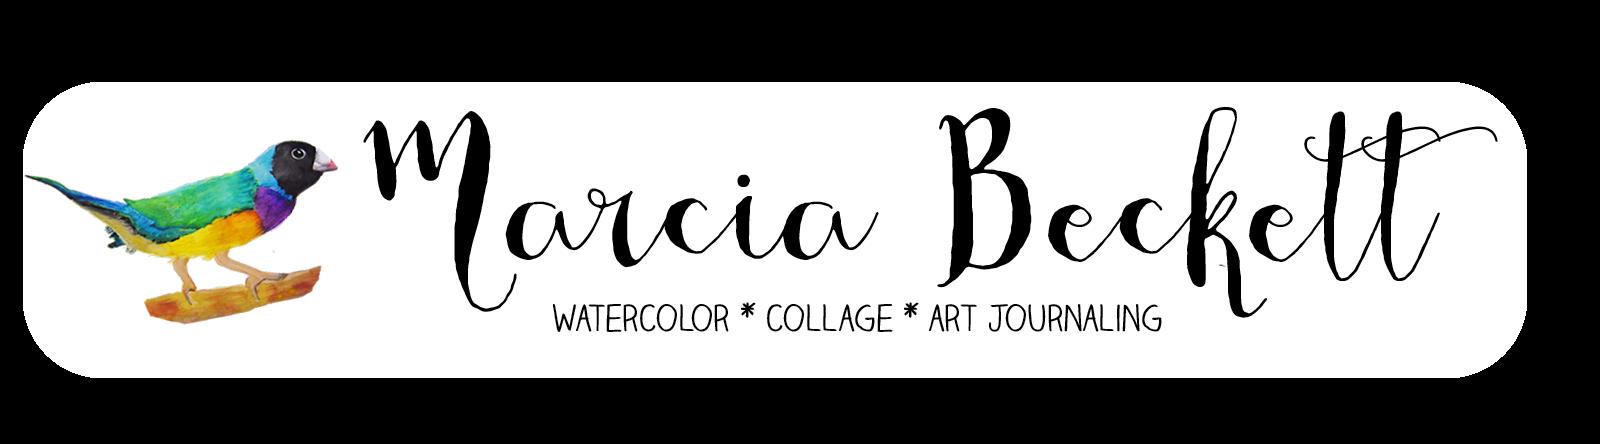 Marcia Beckett